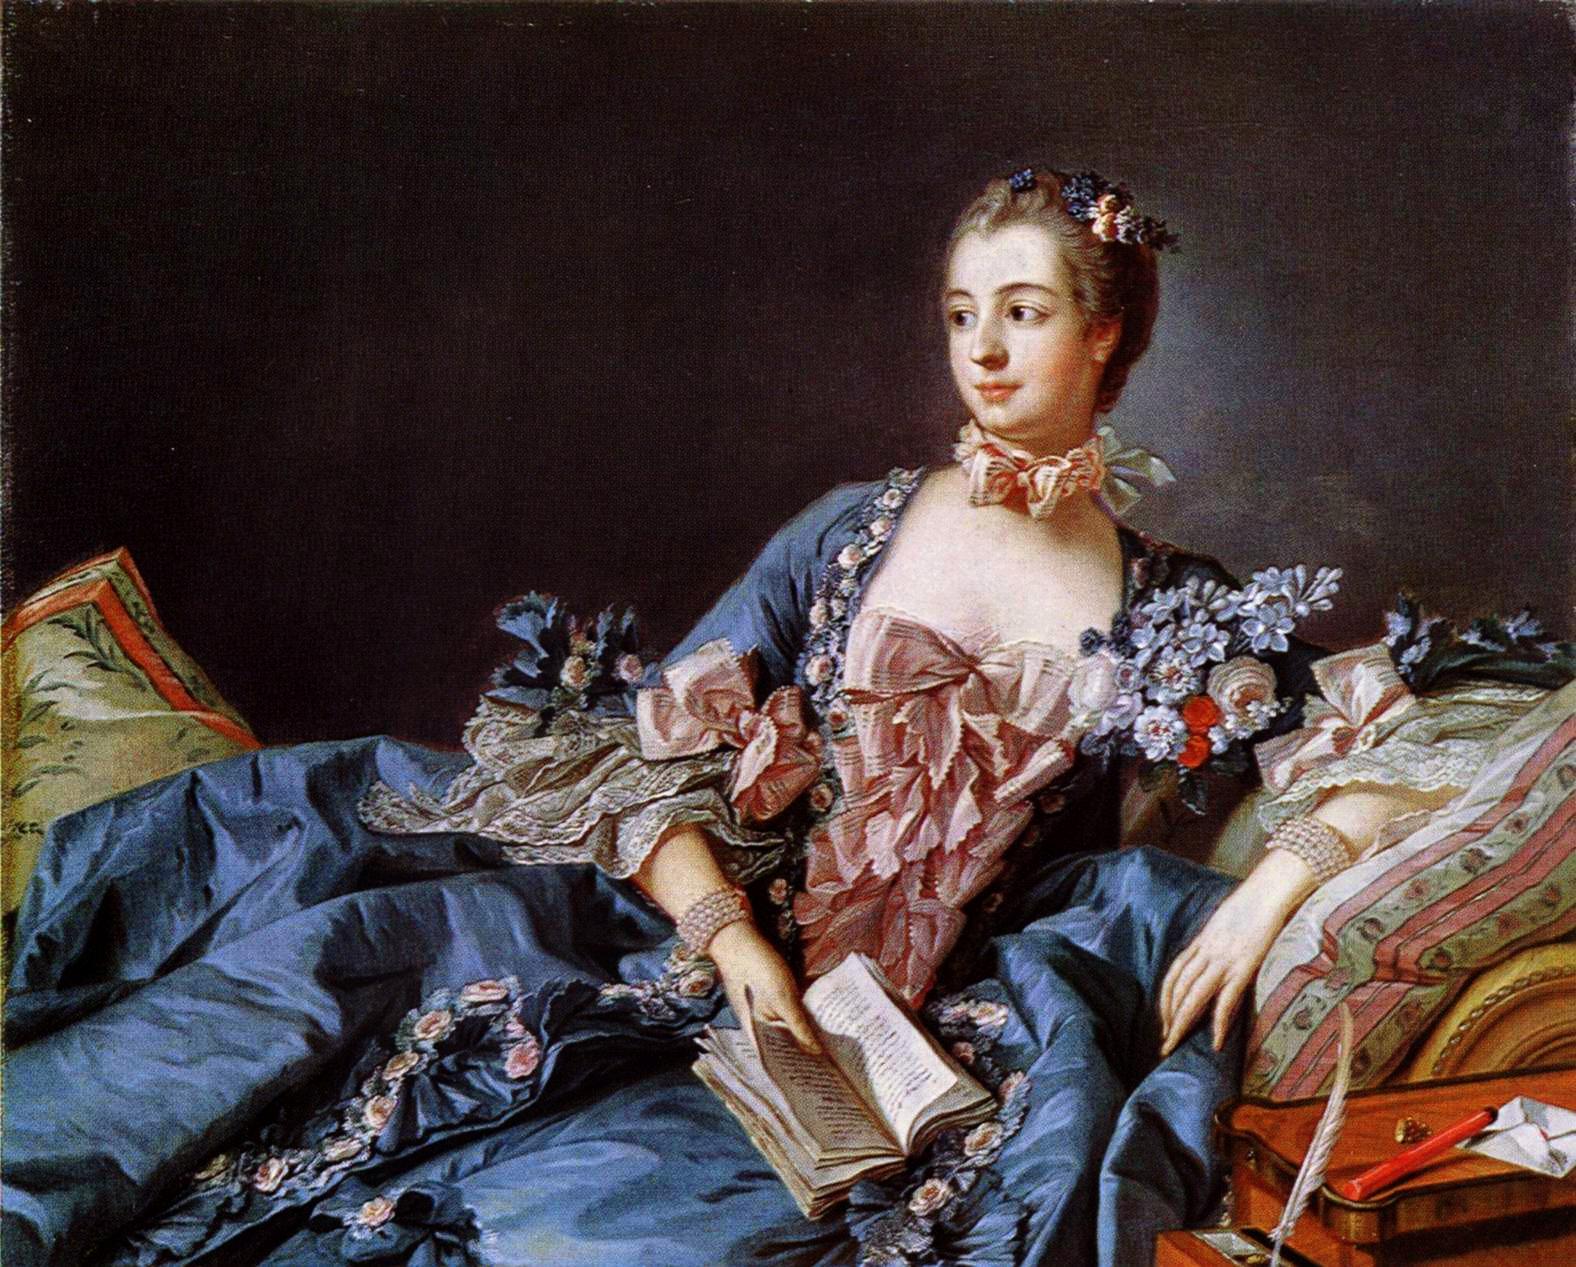 http://upload.wikimedia.org/wikipedia/commons/d/d0/François_Boucher_019_(Madame_de_Pompadour).jpg